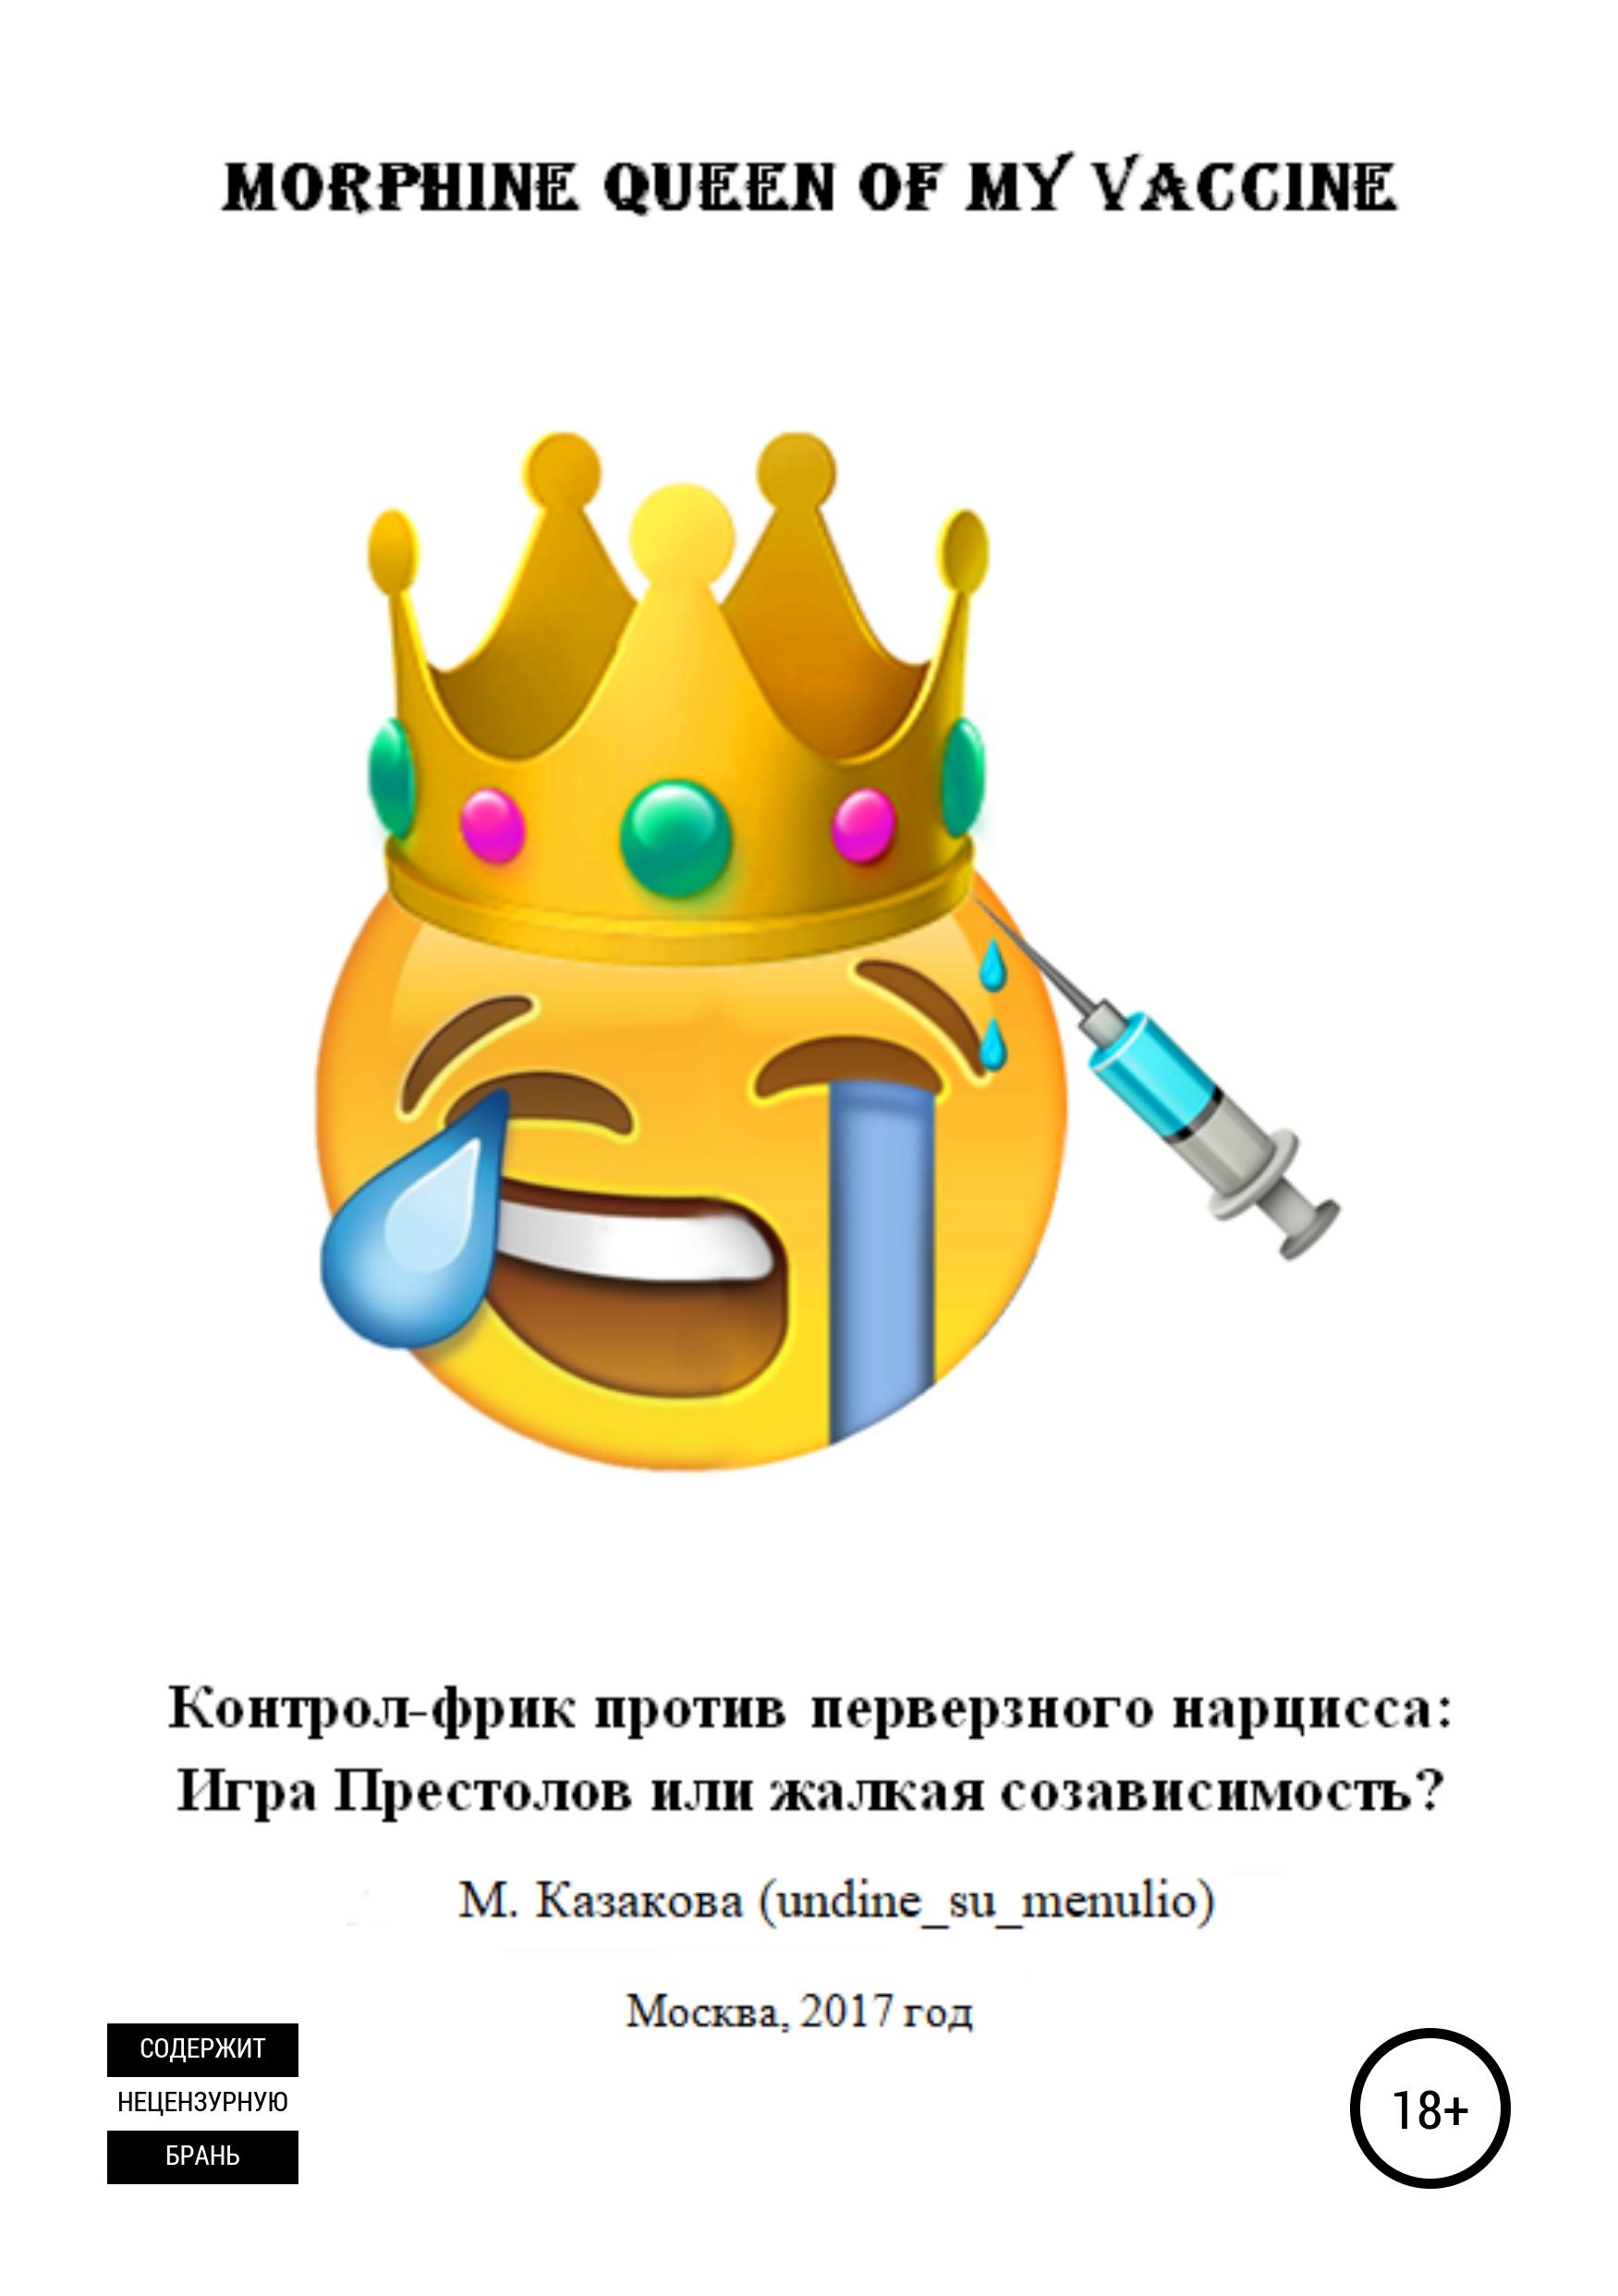 Morphine queen of my vaccine. Контрол-фрик против перверзного нарцисса: Игра Престолов или жалкая созависимость?